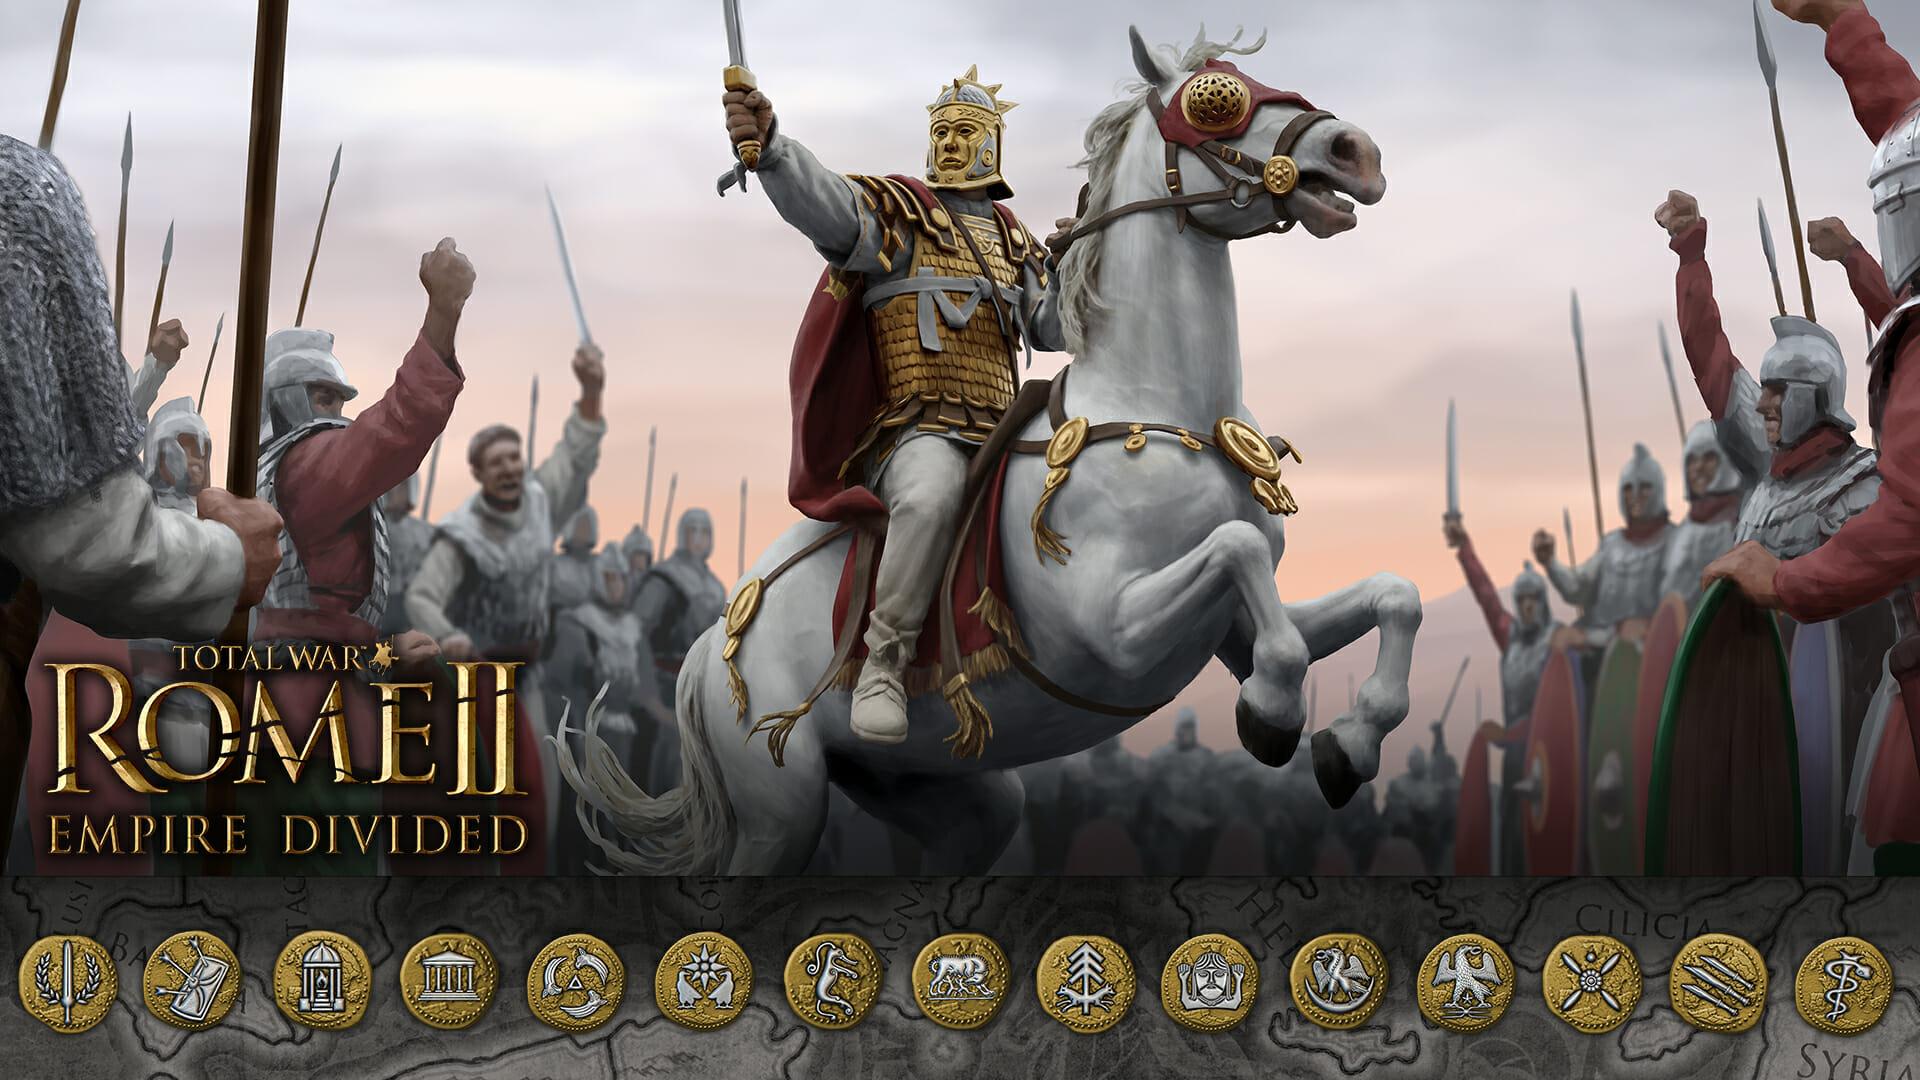 Total War Rome Ii Empire Divided Steam Achievements Total War